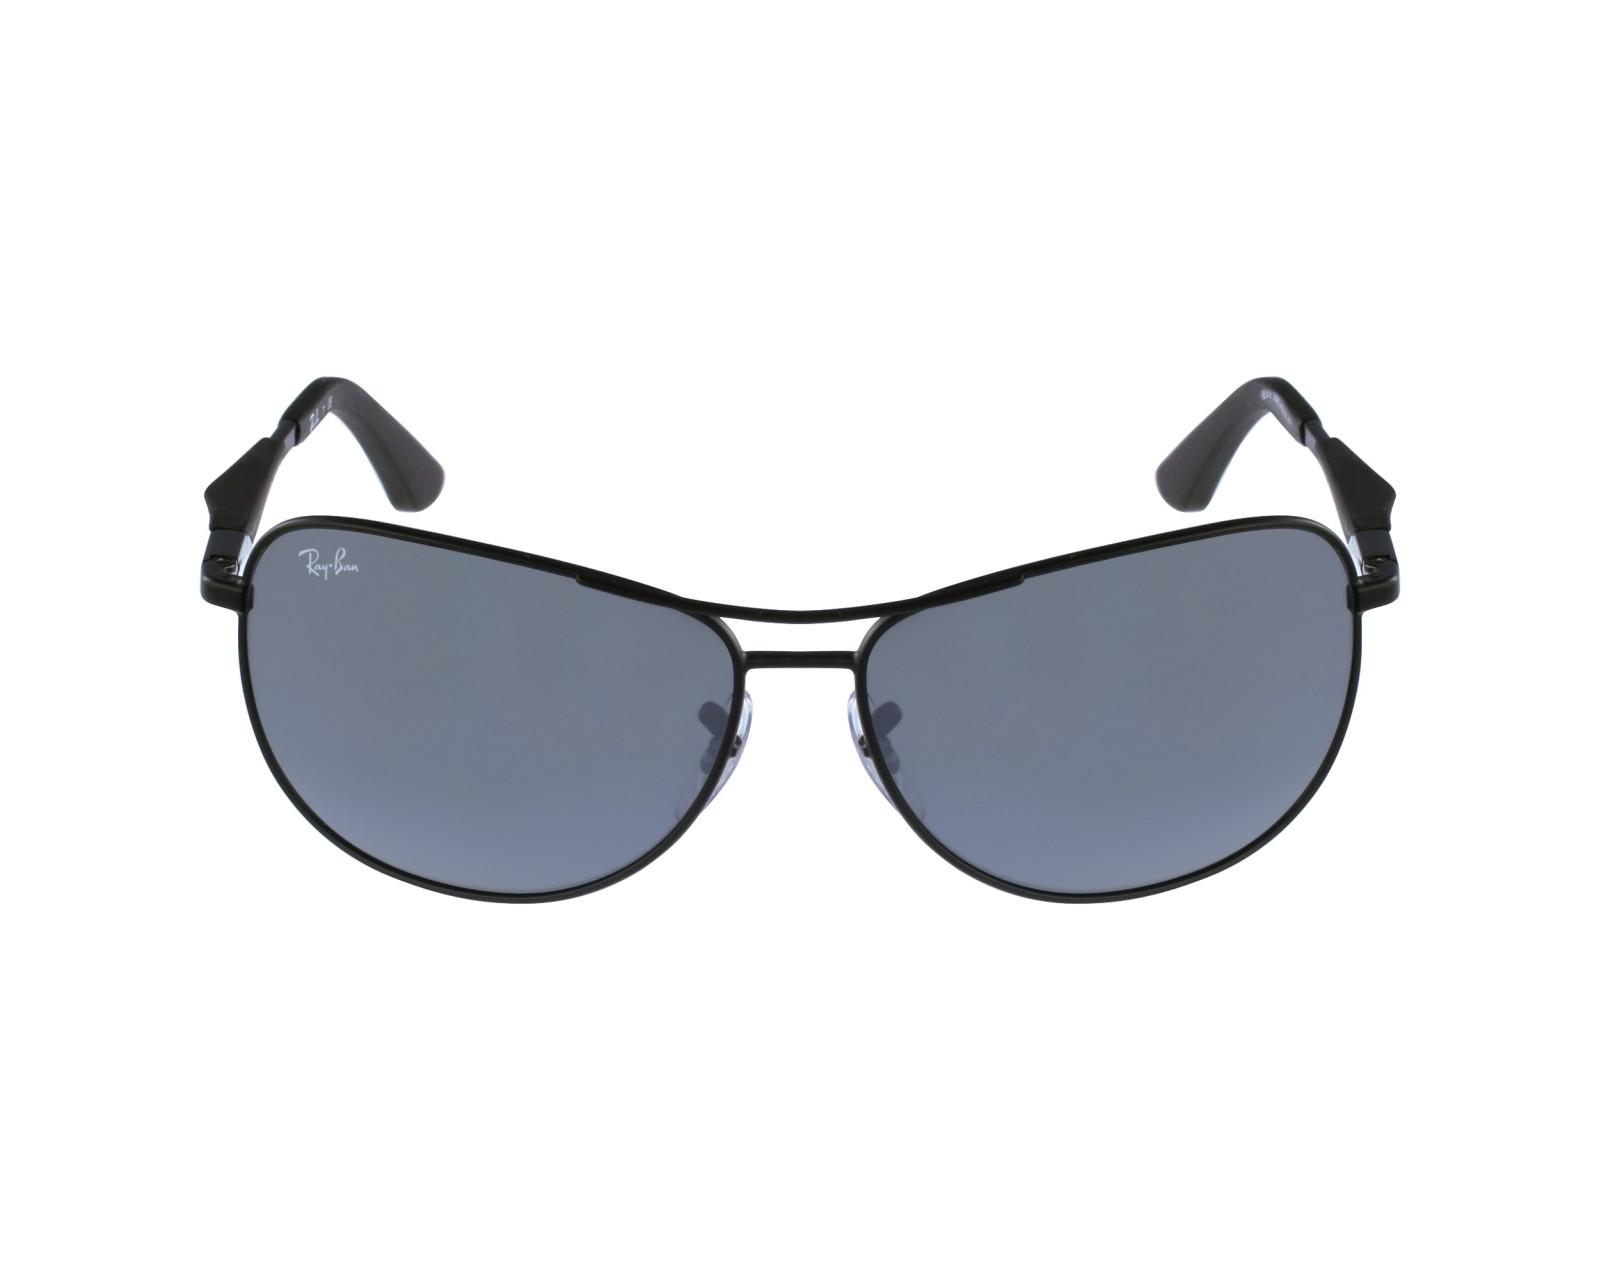 11a5f159bf thumbnail Sunglasses Ray-Ban RB-3519 006 6G - Black profile view